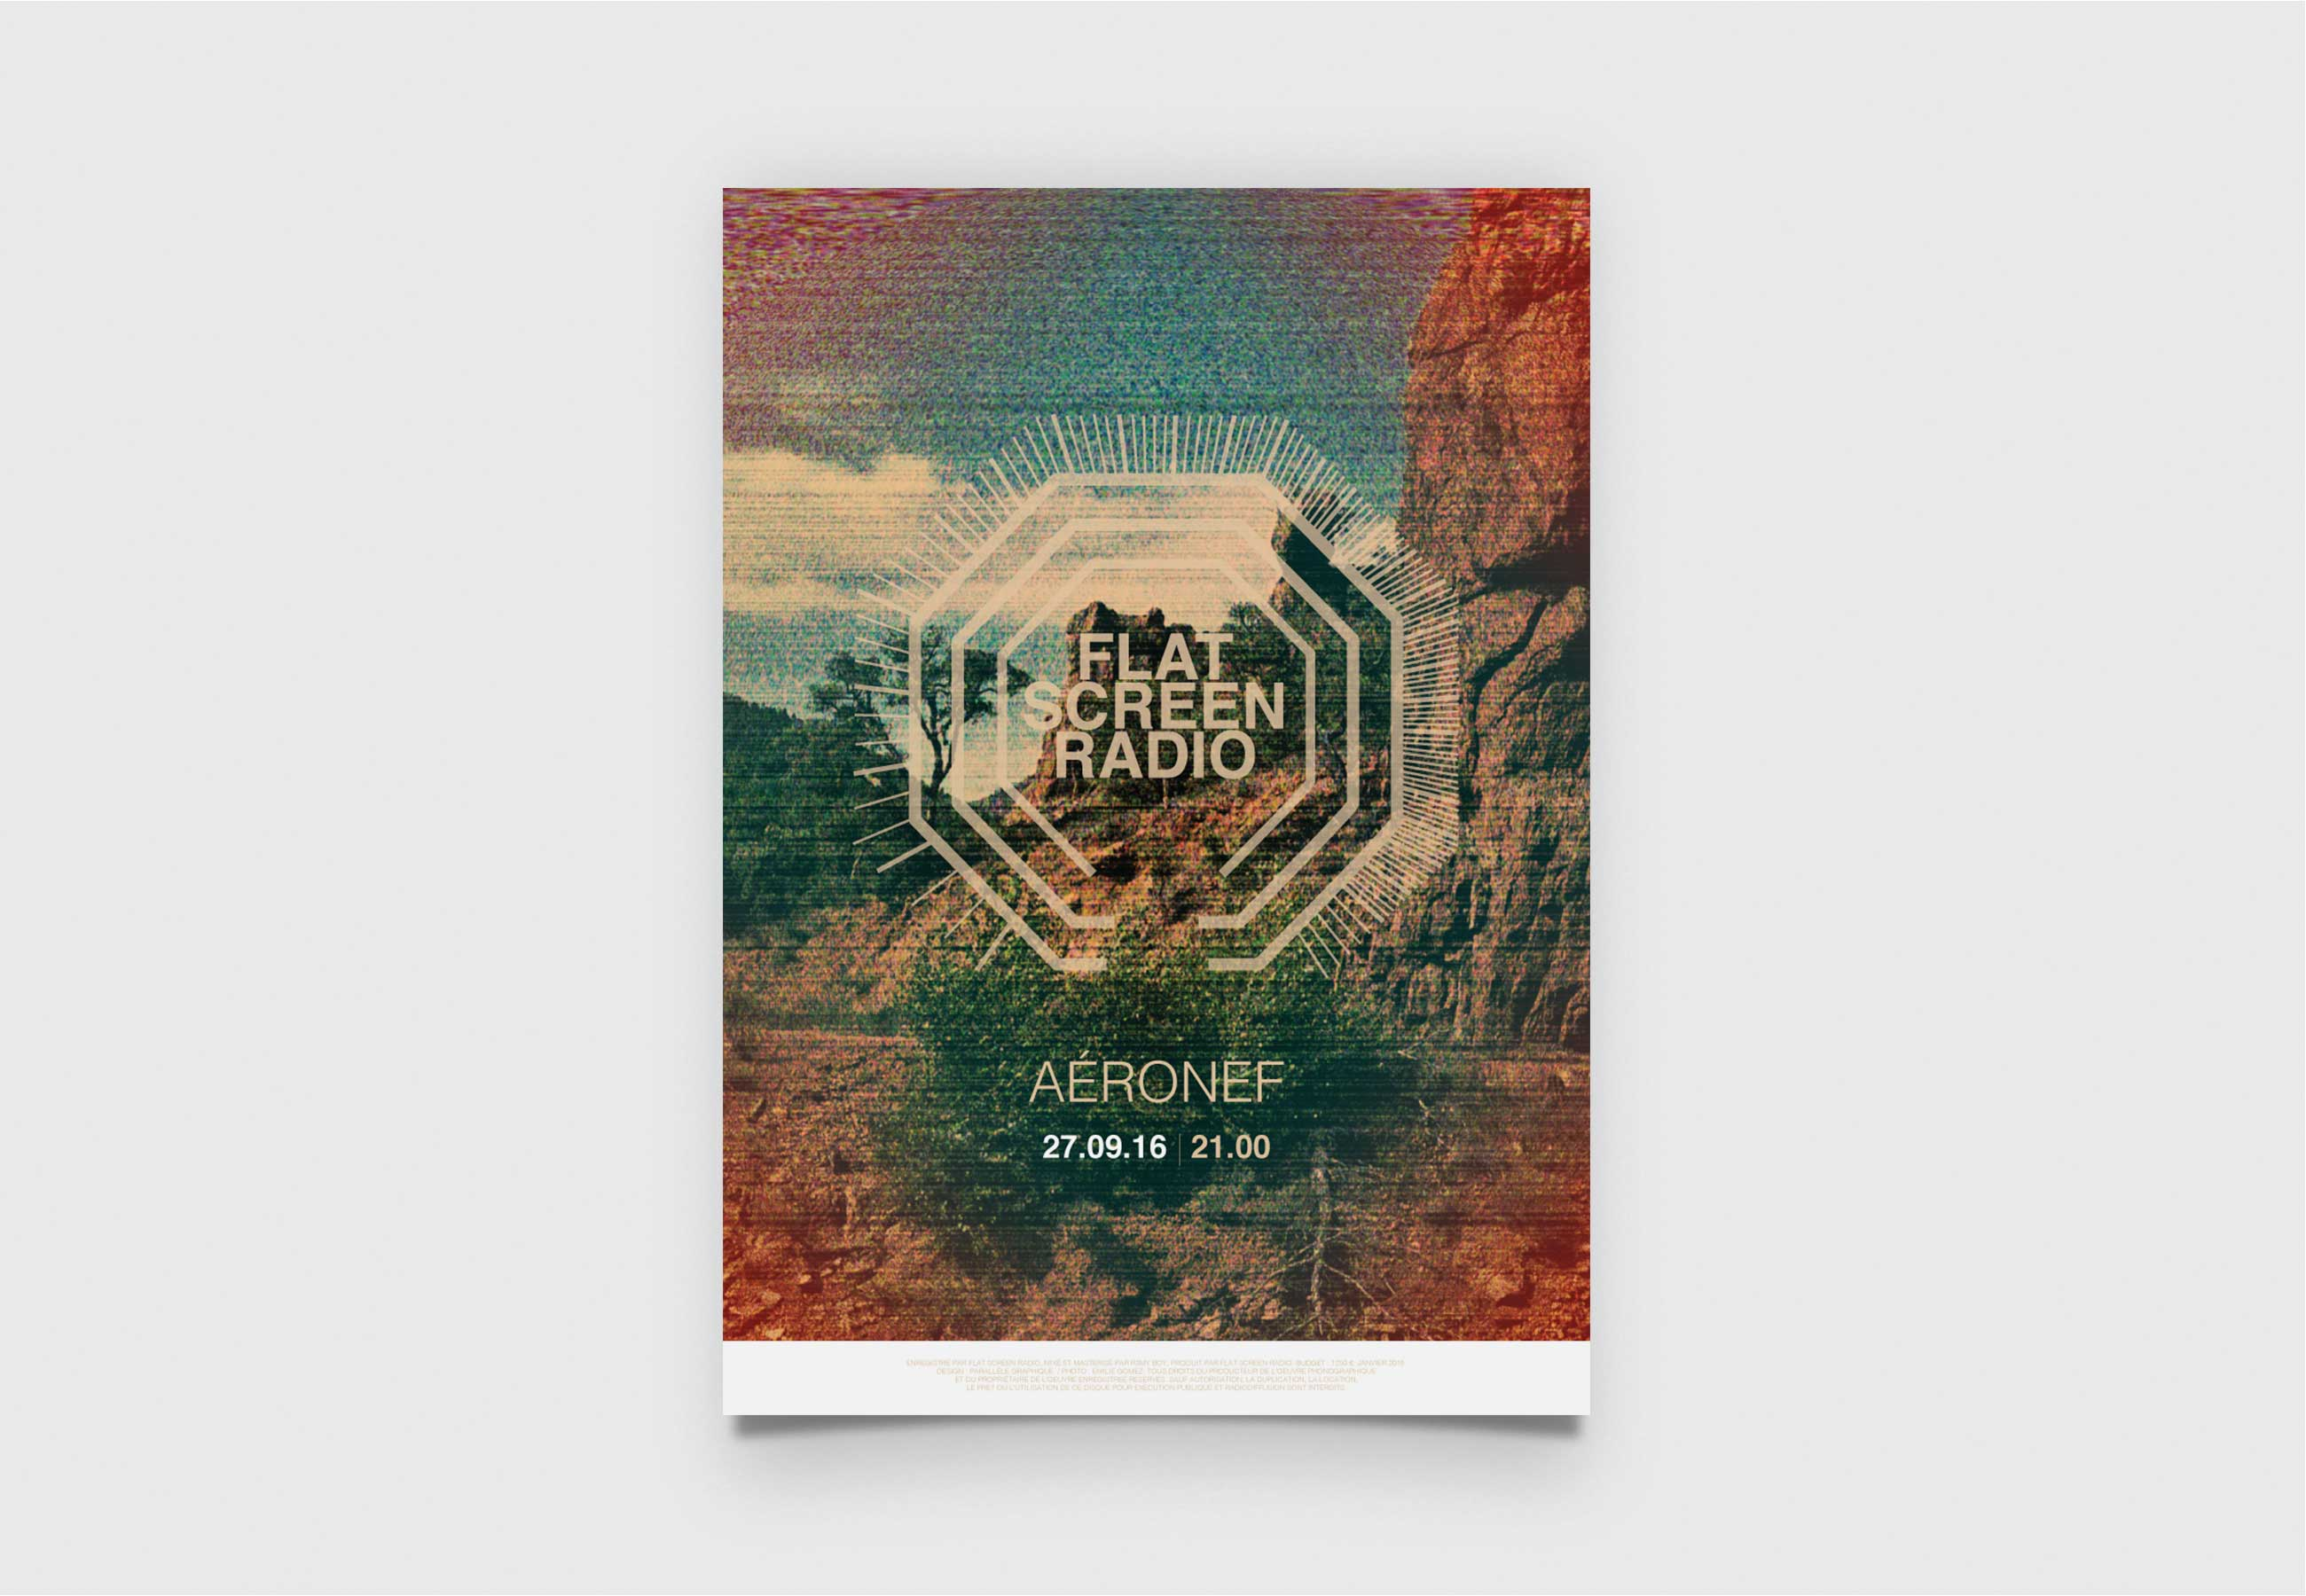 flat_screen_radio_01_parallele_graphique